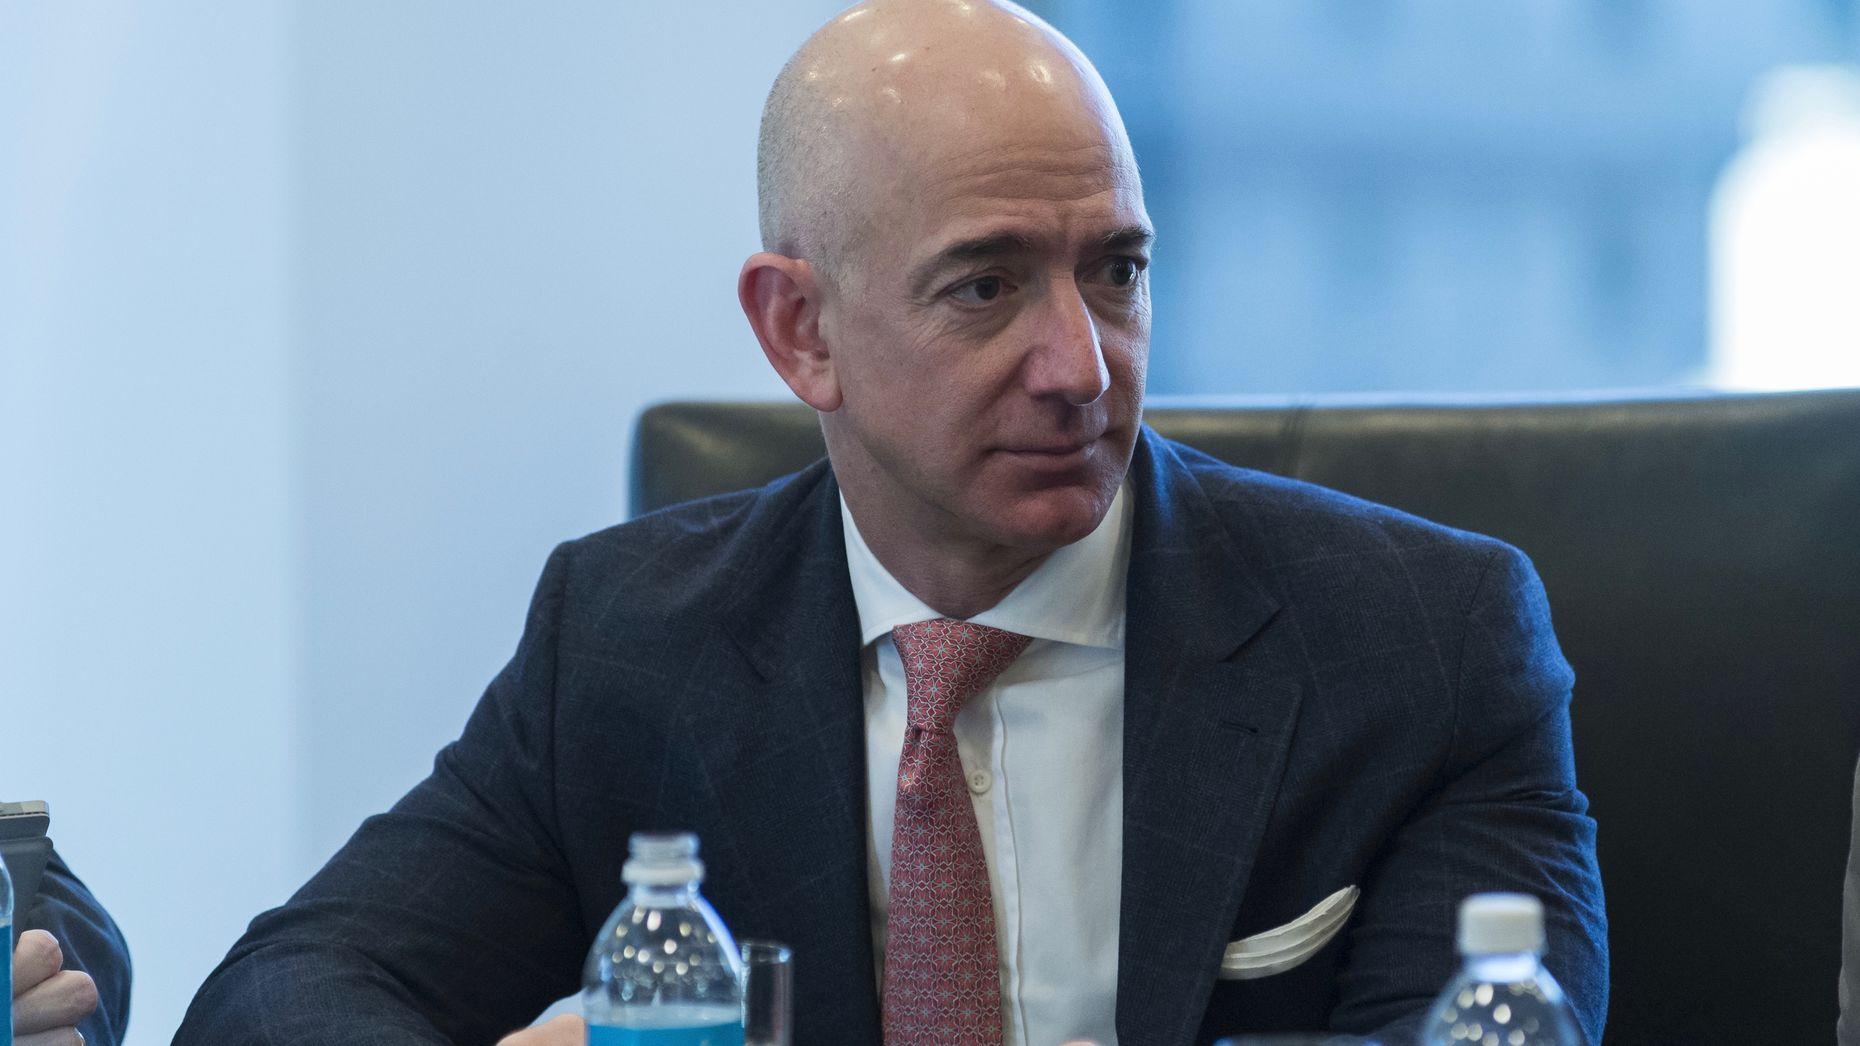 Amazon CEO Jeff Bezos. Photo by Bloomberg.